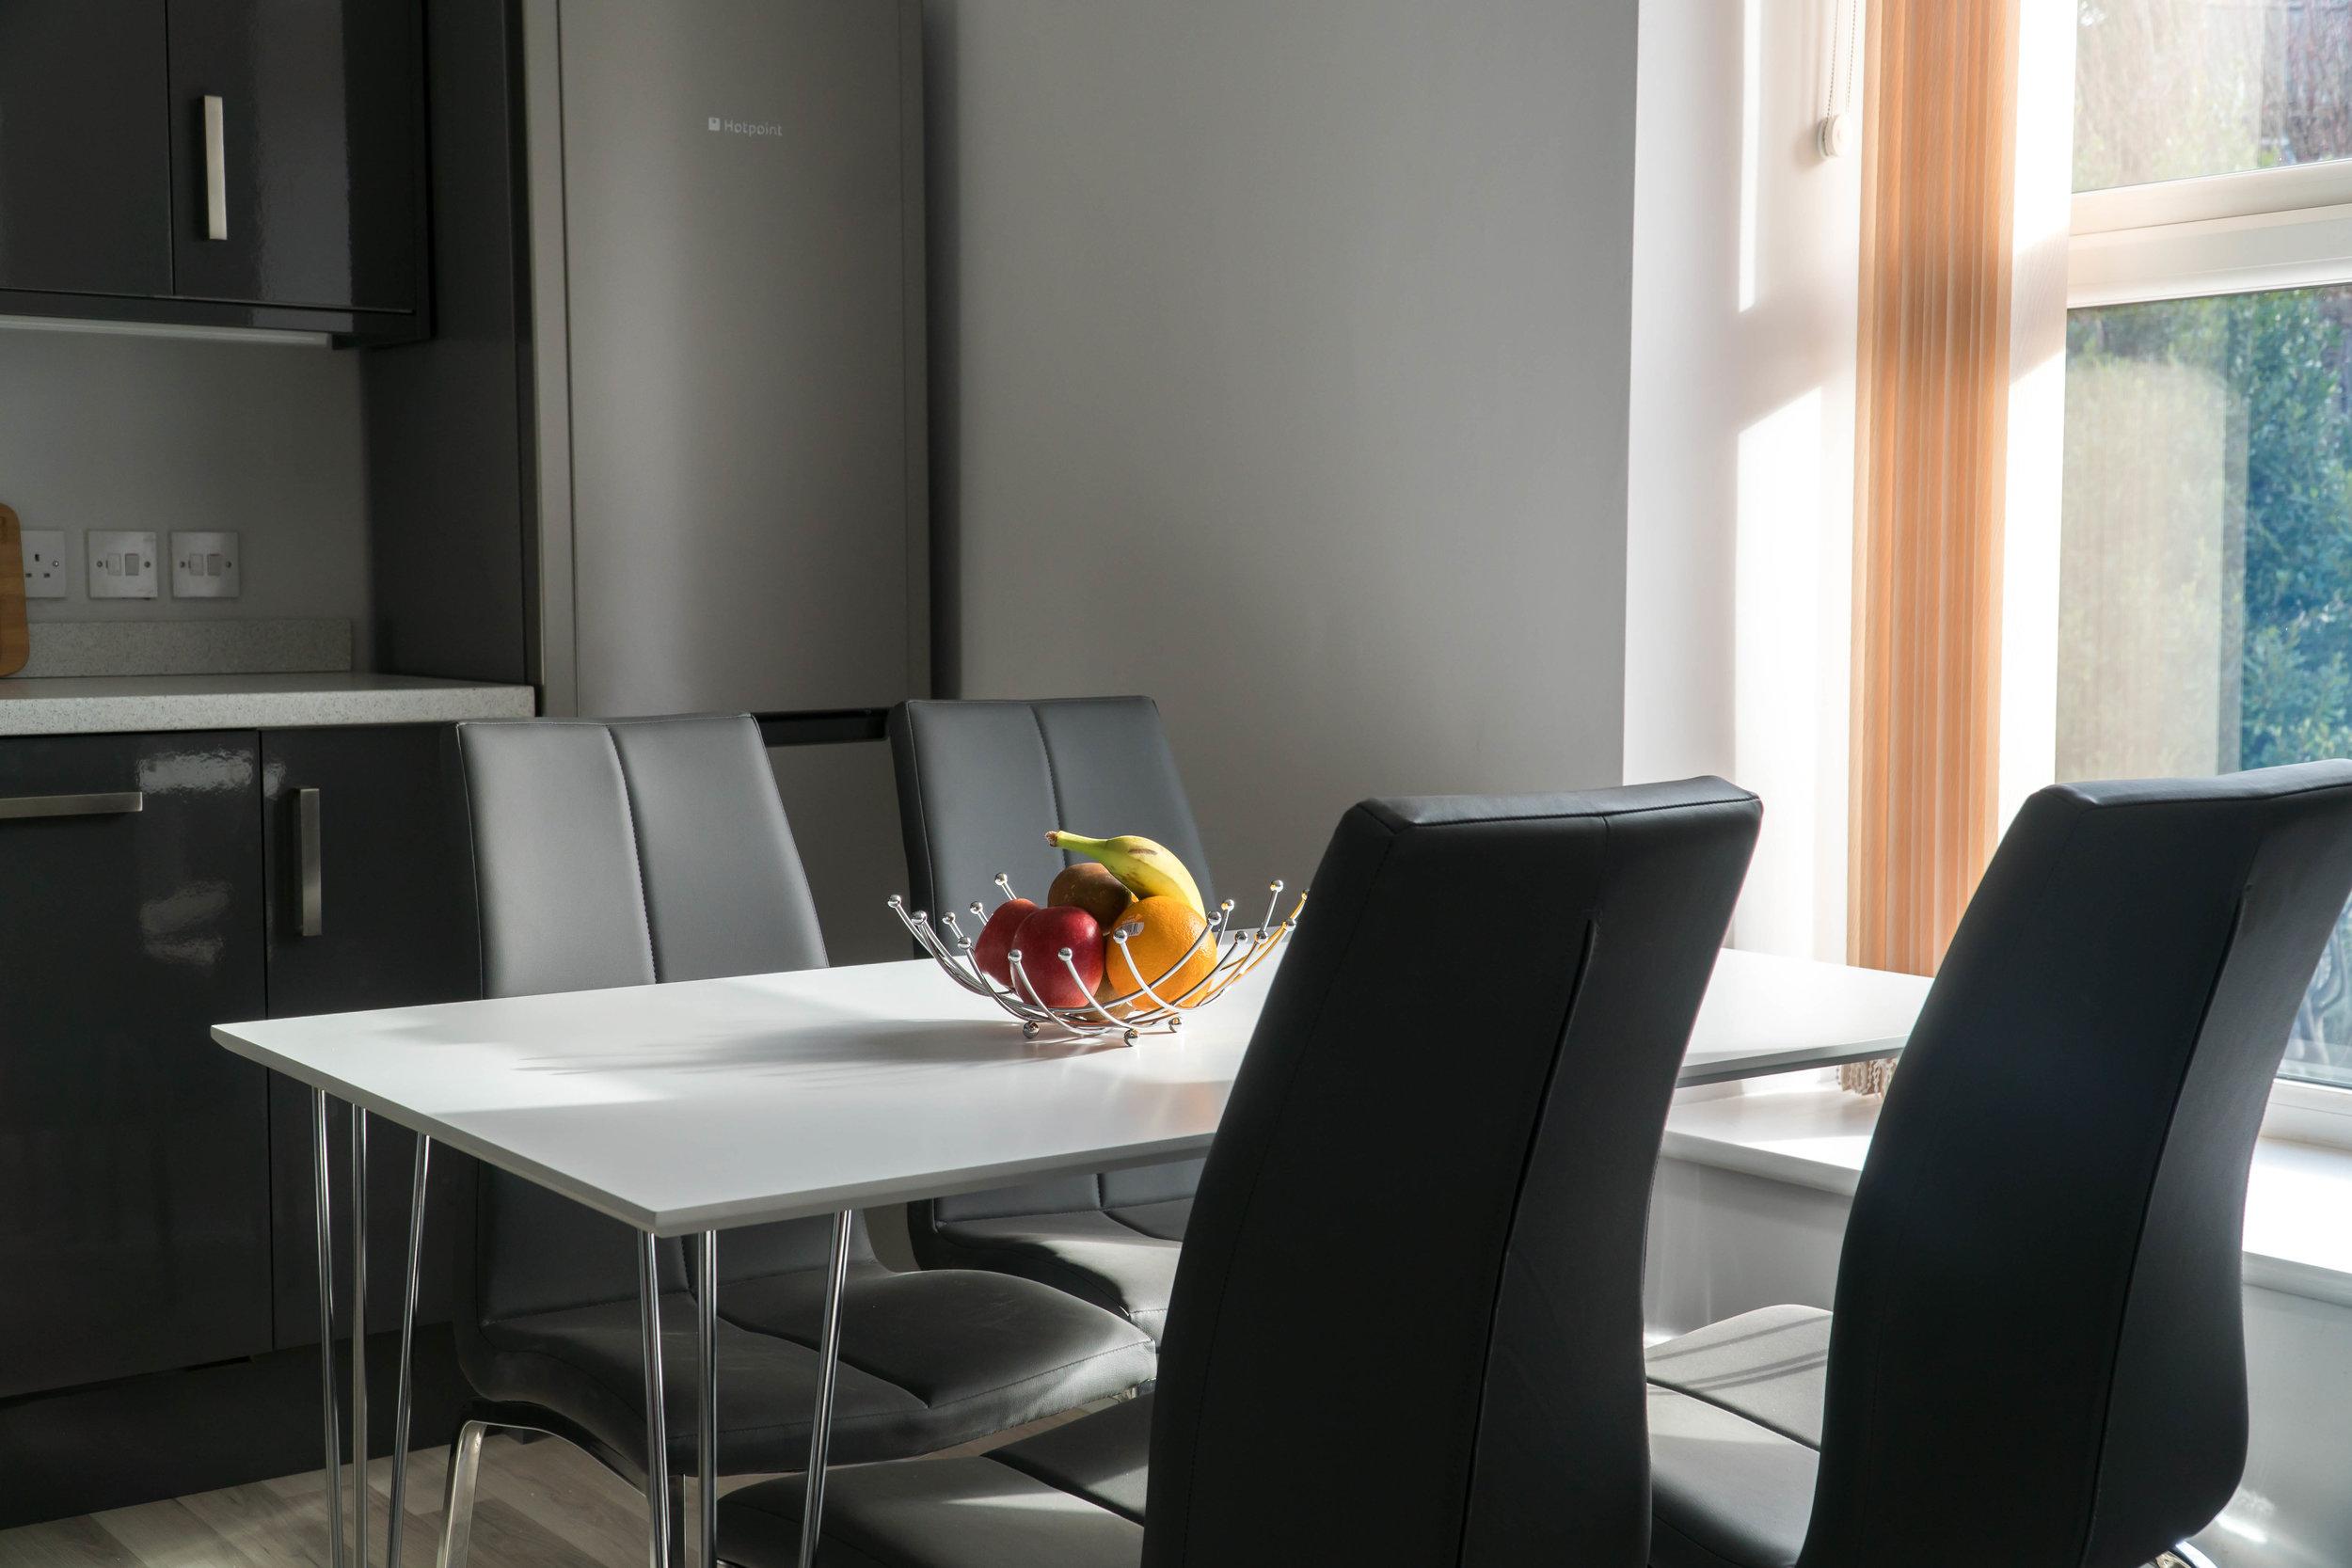 Vectis Holiday Homes - Holiday Apartments